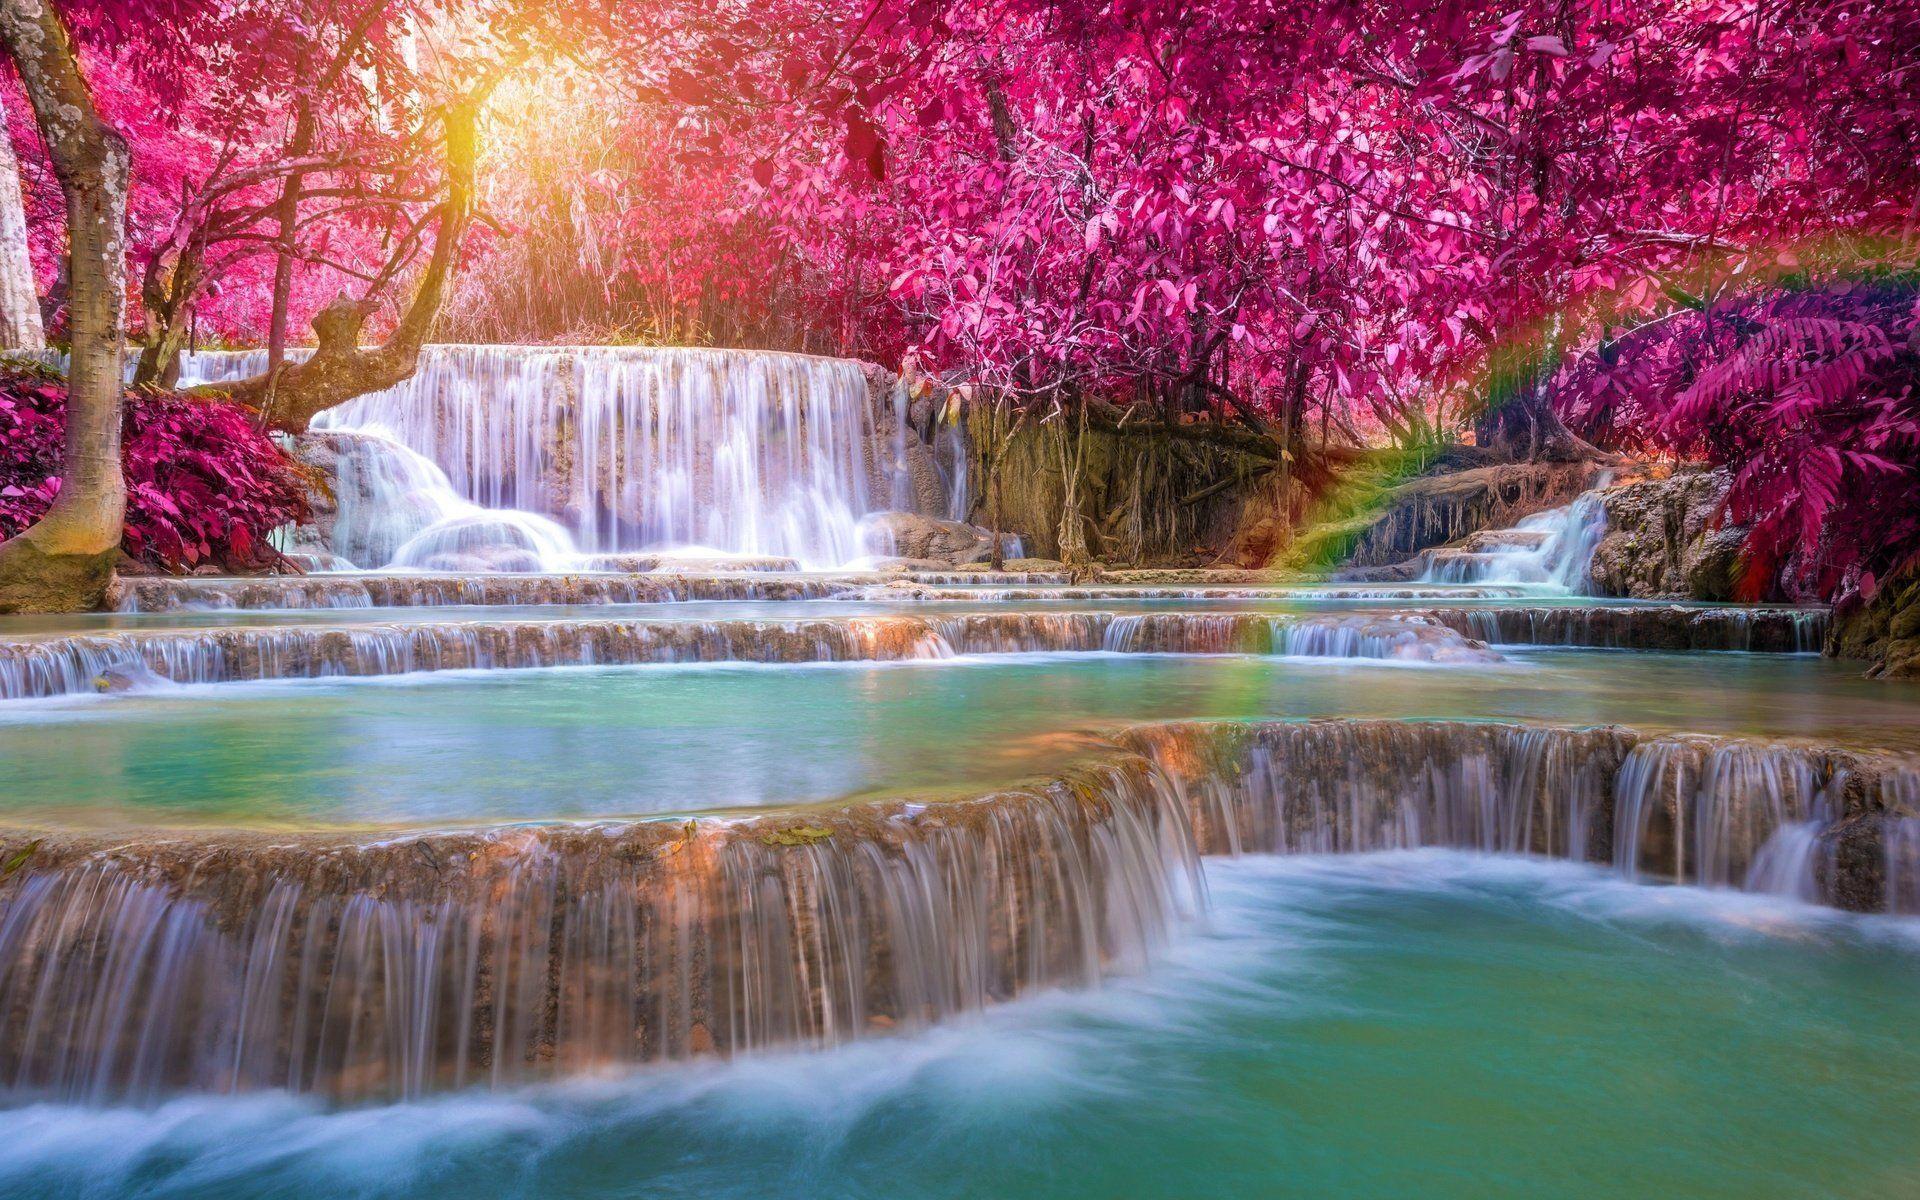 Earth Waterfall Nature Rainbow Tree Foliage Wallpaper Natural Pool Waterfall Waterfall Wallpaper